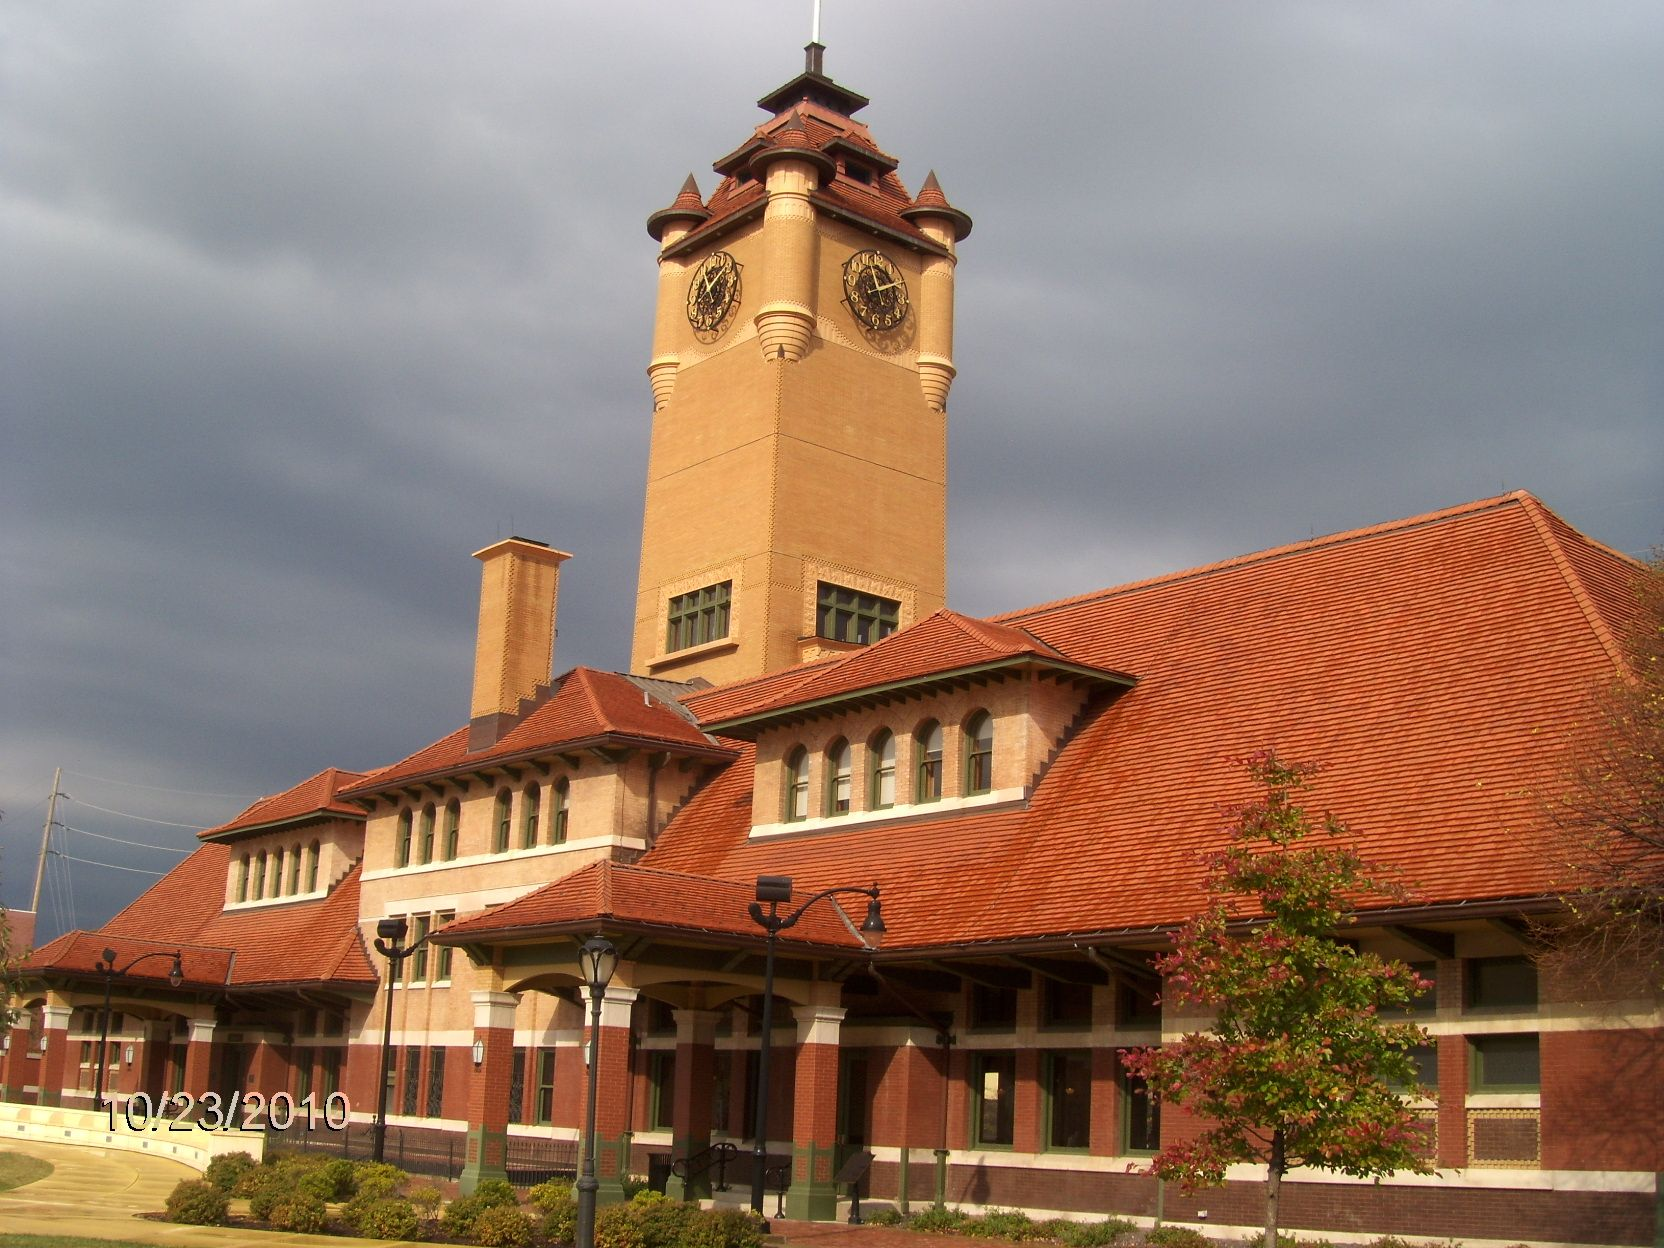 Lincoln Museum - Railroad Station, Springfield Illinois